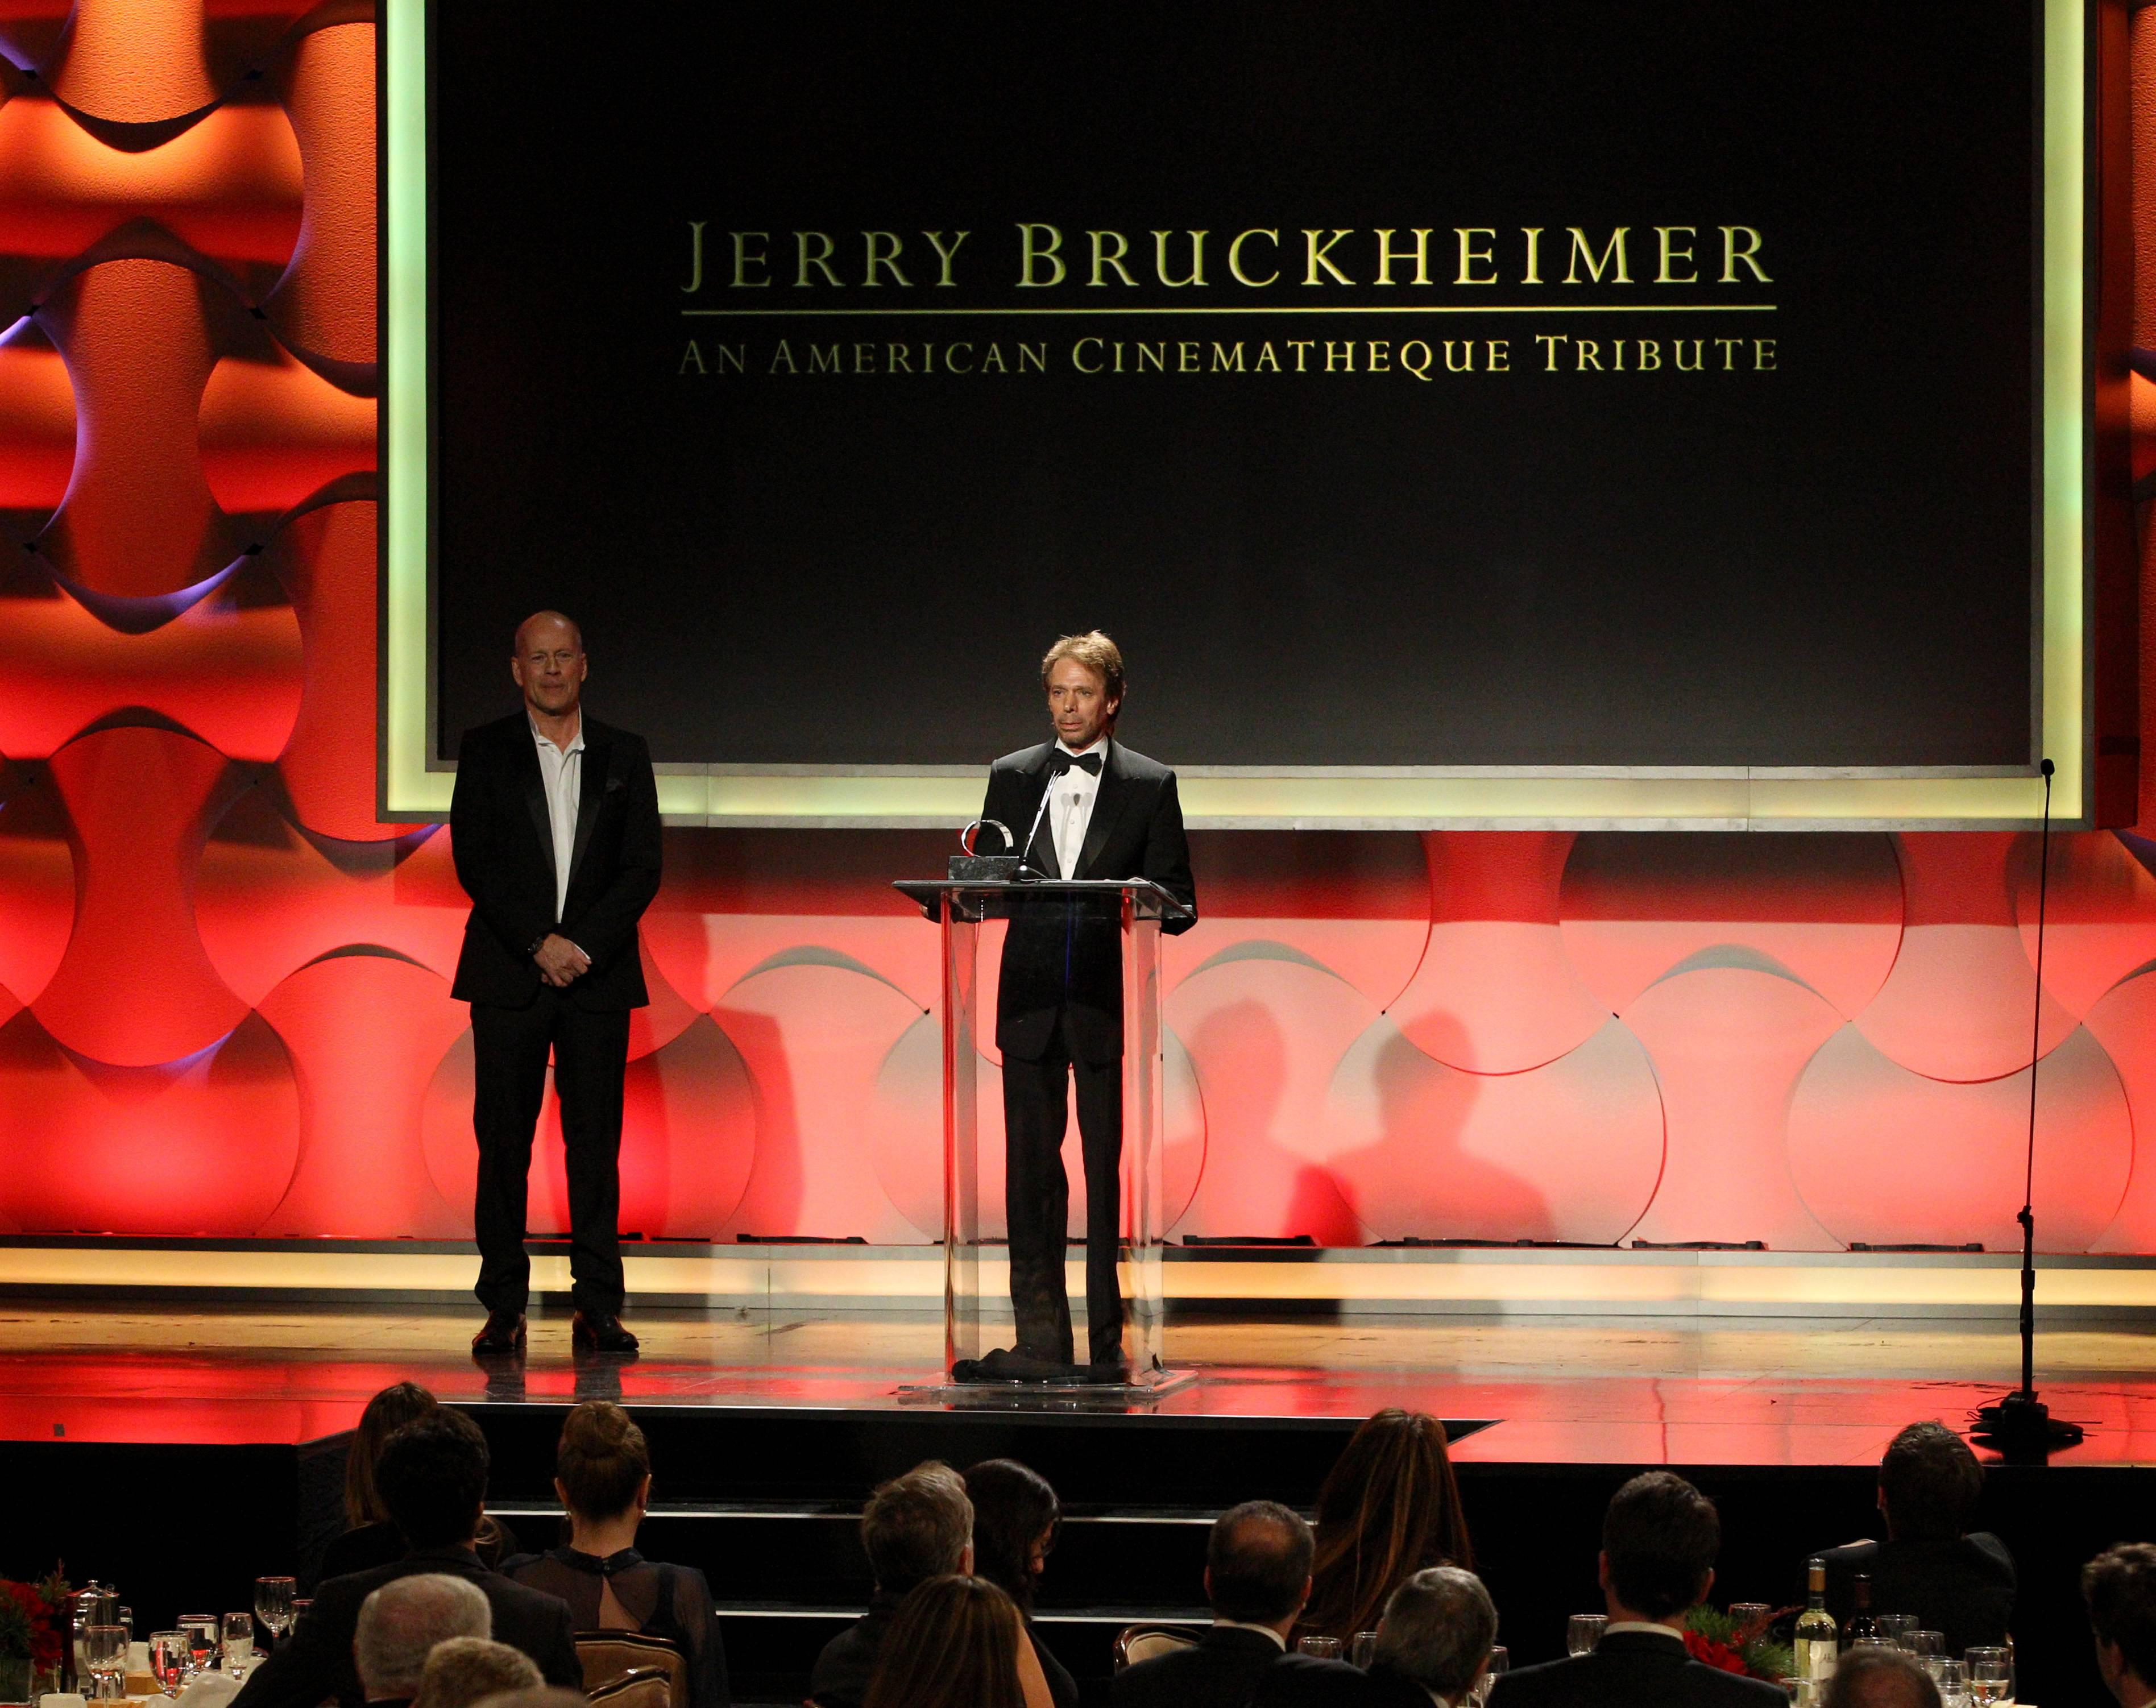 Bruce Willis, Jerry Bruckheimer